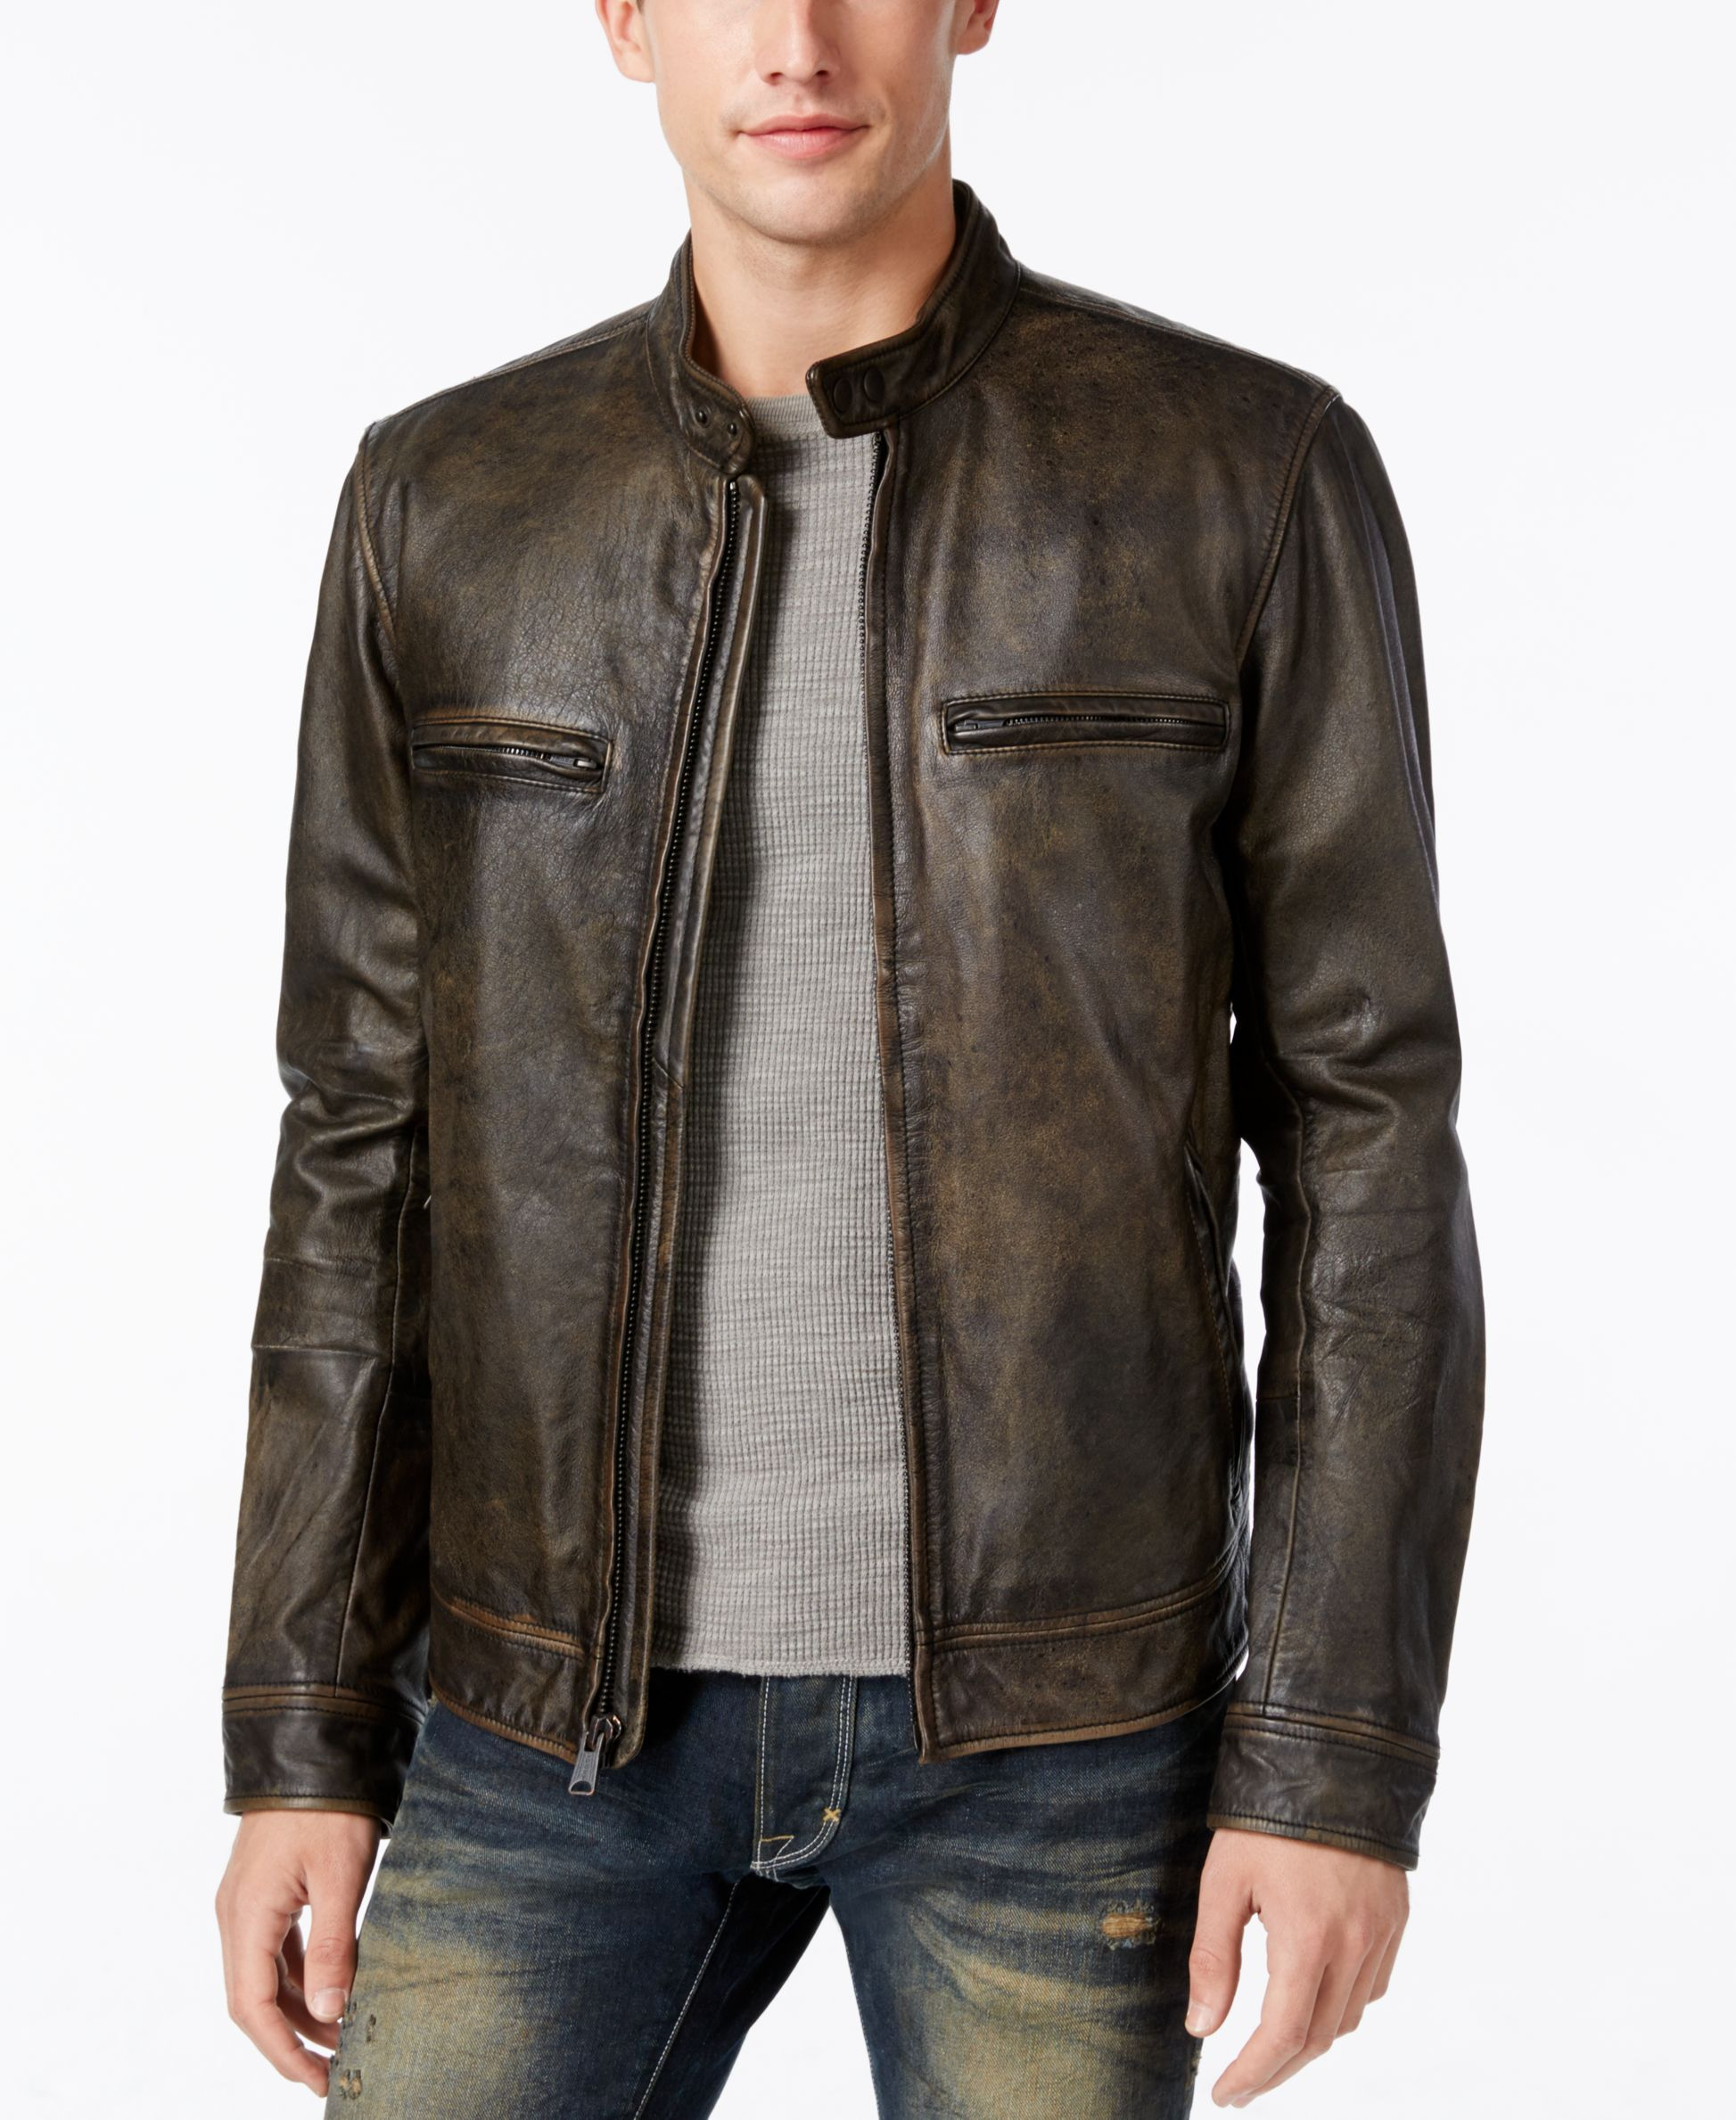 Lucky Brand Men S Cafe Racer Leather Moto Jacket Leather Jacket Men Man Cafe Cafe Racer Jacket [ 2378 x 1947 Pixel ]